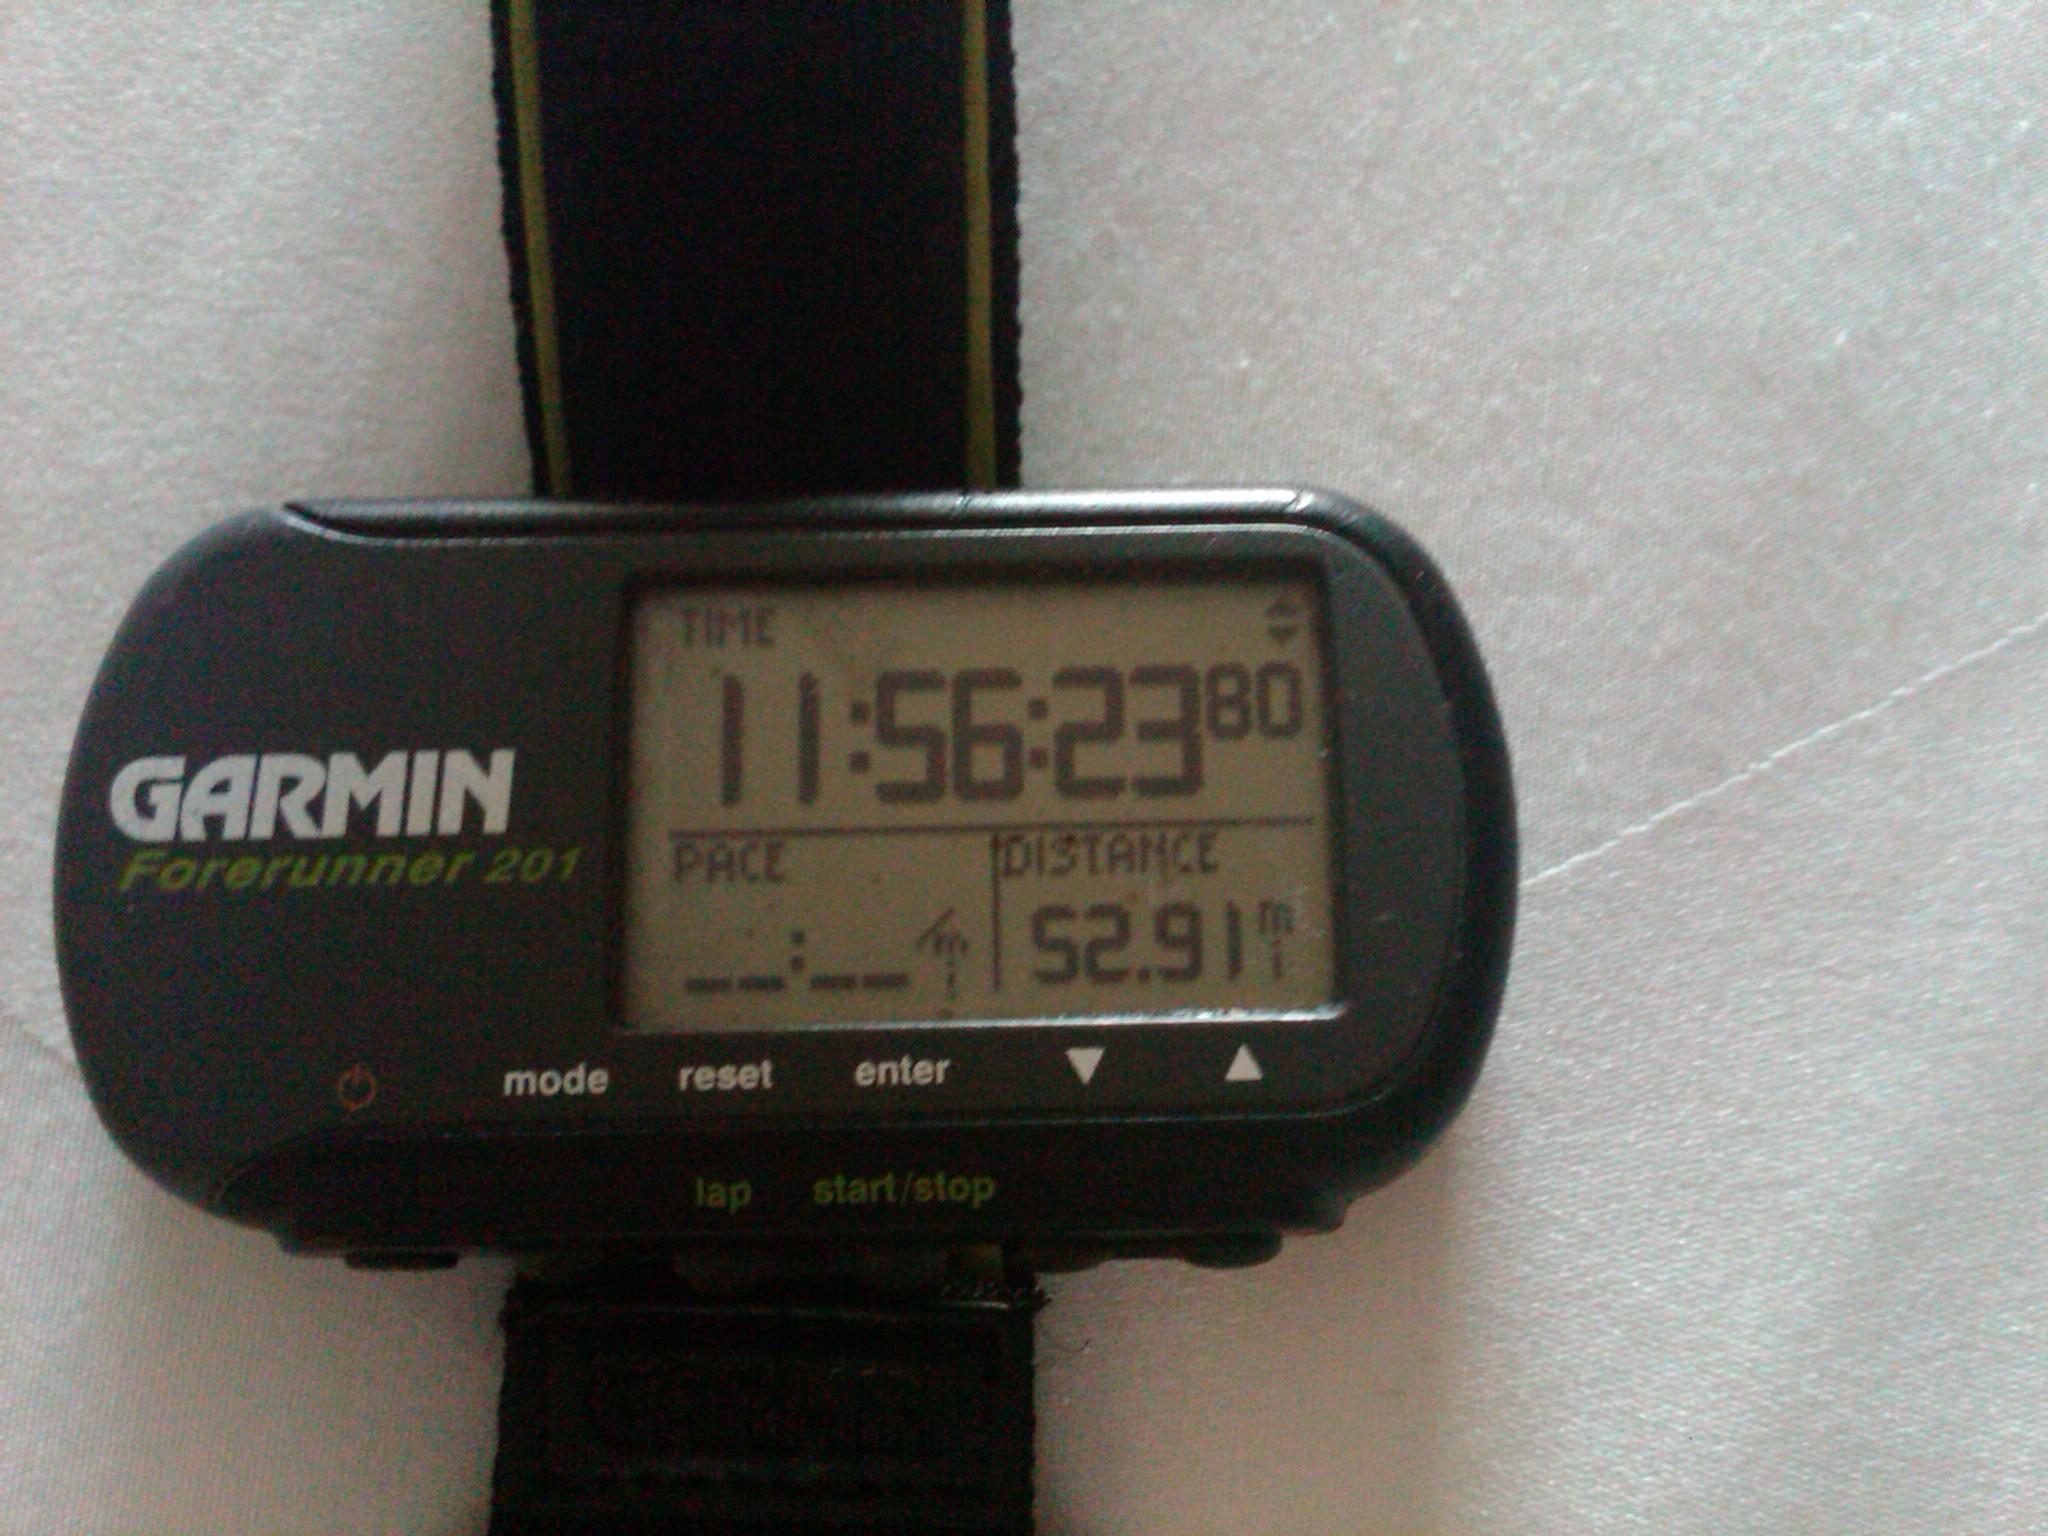 11:56:23hours, 52.91miles